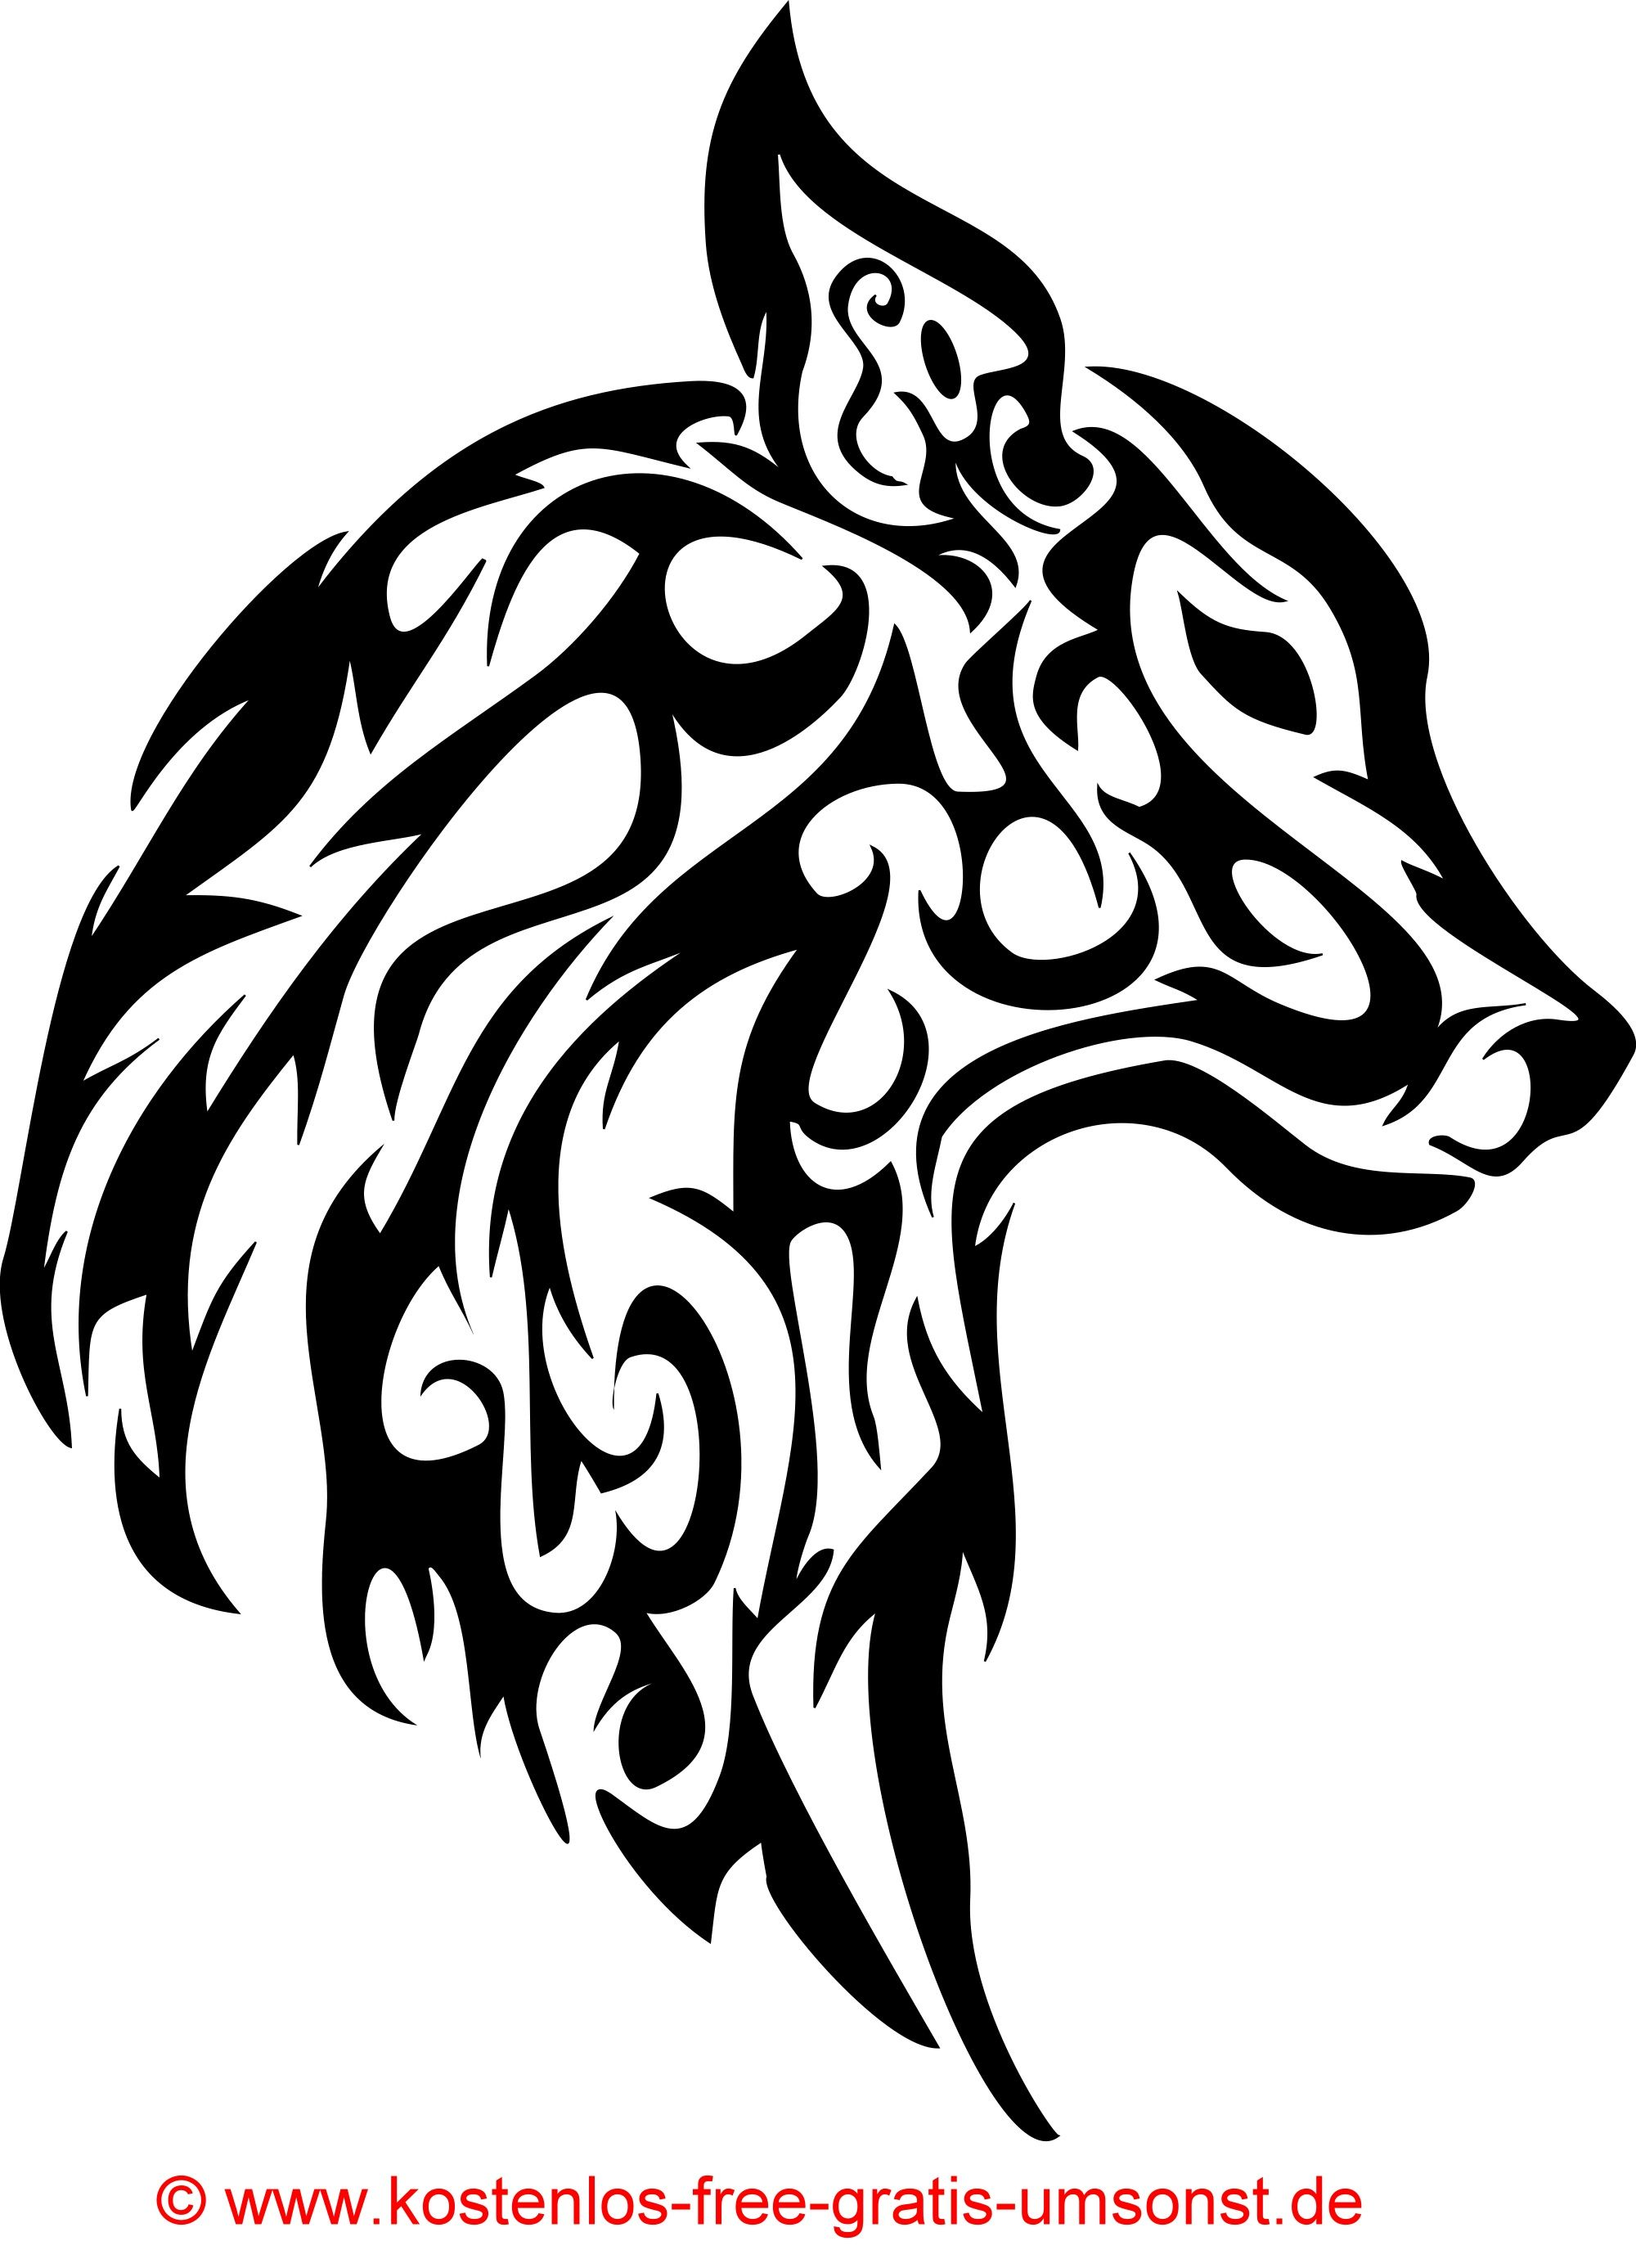 tiere tattoobild hund wolf tattoomotive tribal art black. Black Bedroom Furniture Sets. Home Design Ideas